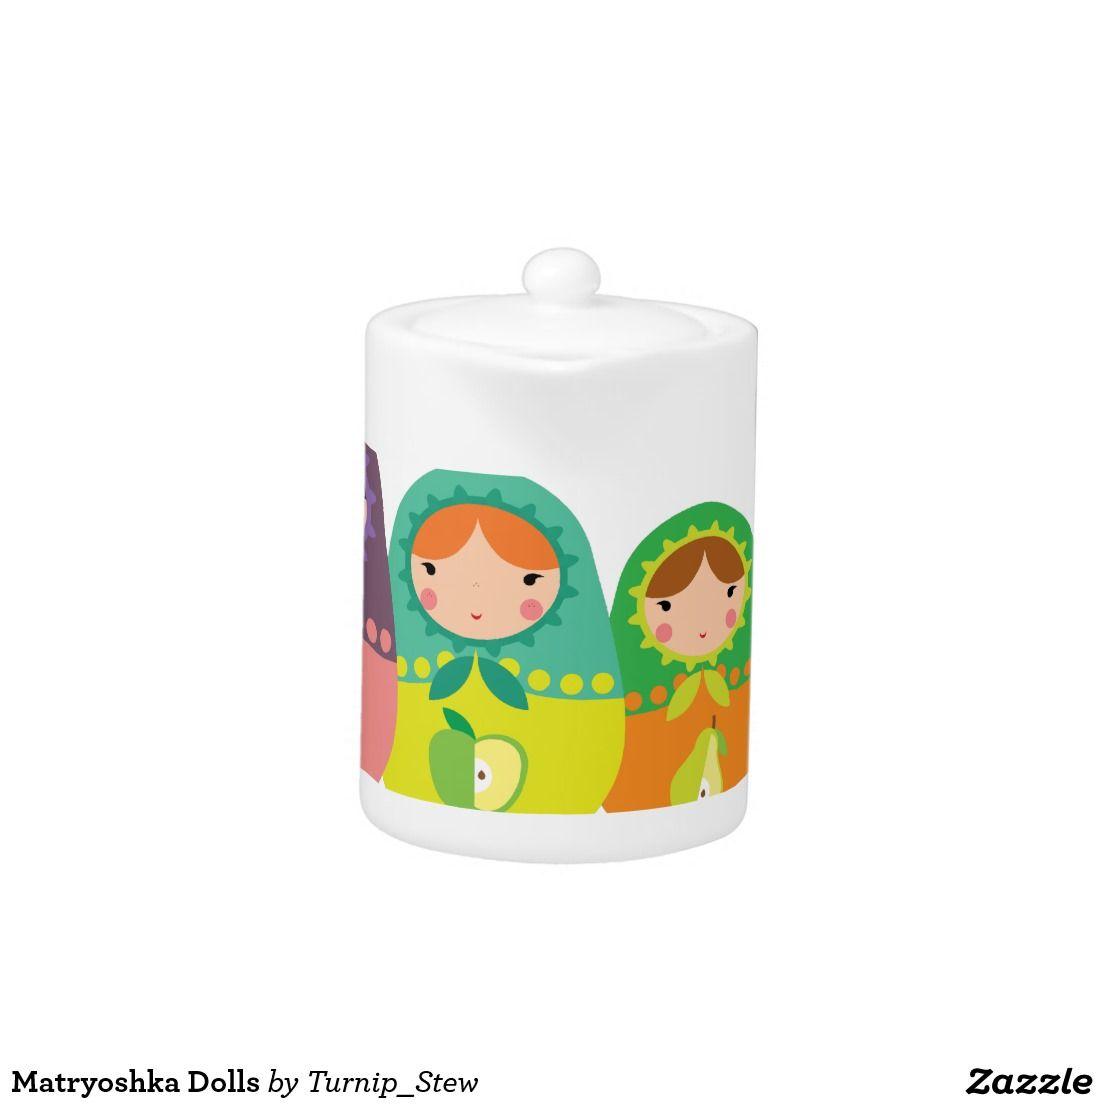 Matryoshka Dolls Teapot